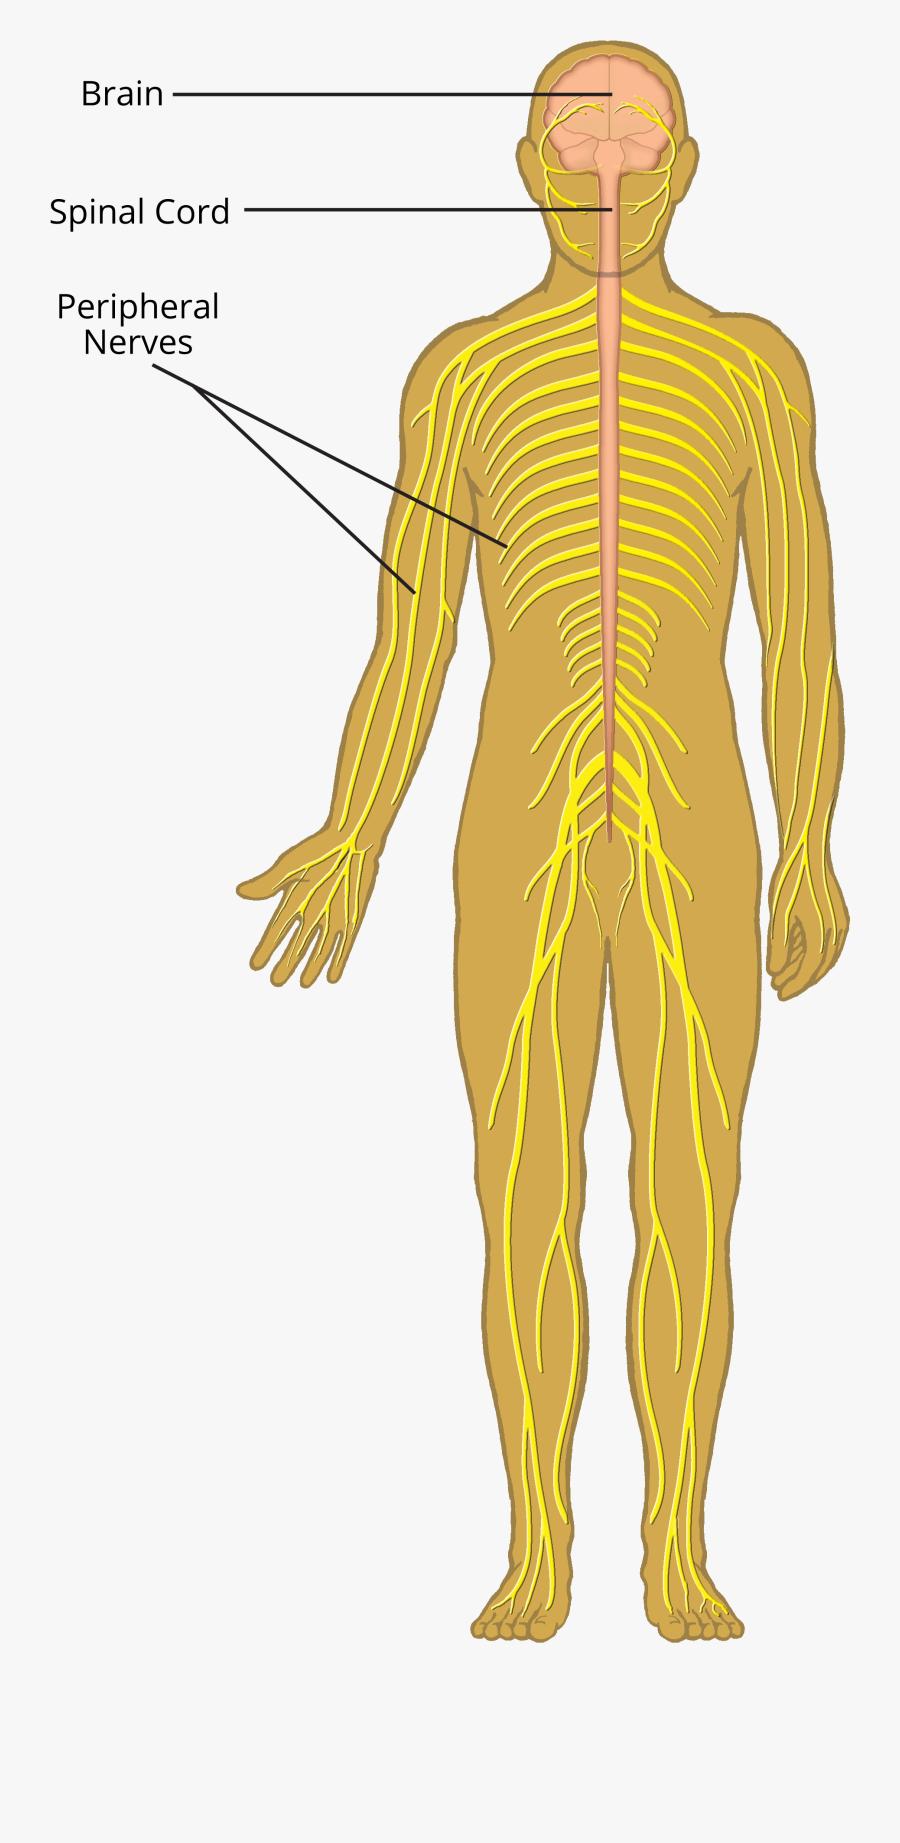 Clip Art Nervous System Pictures - Peripheral Nervous System Cartoon, Transparent Clipart